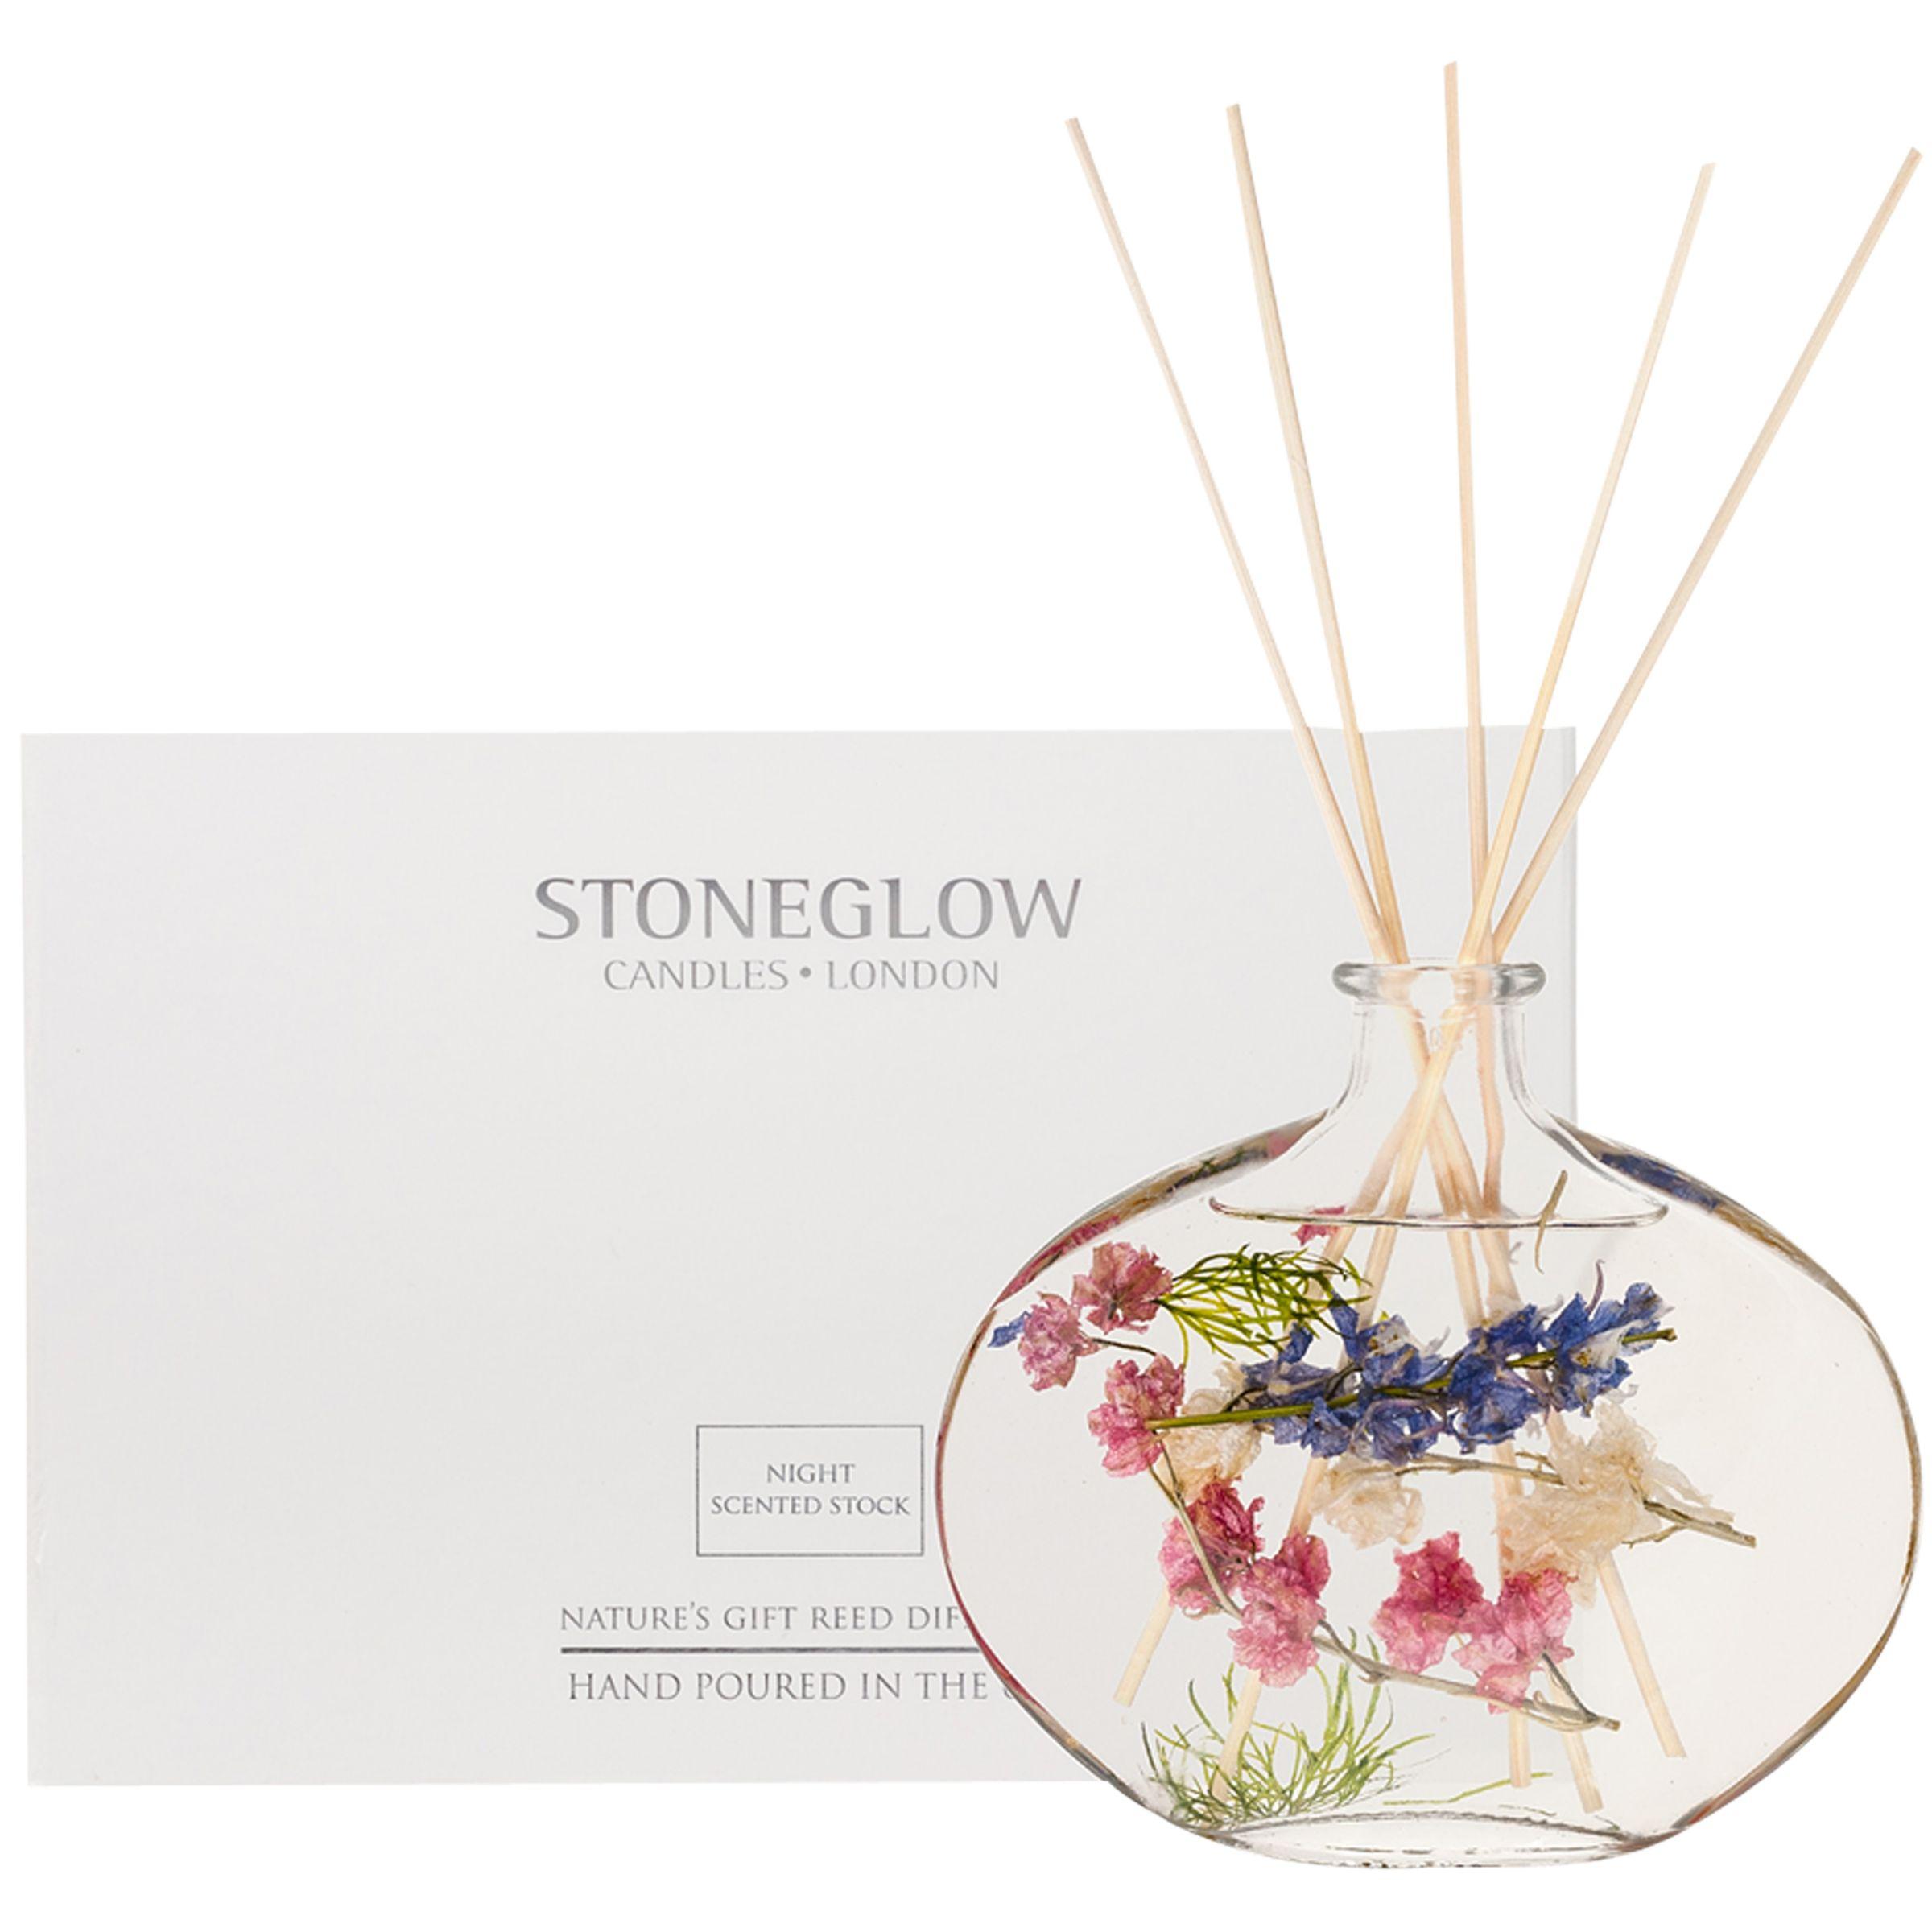 Stoneglow Stoneglow Night Scented Stock Diffuser, 200ml